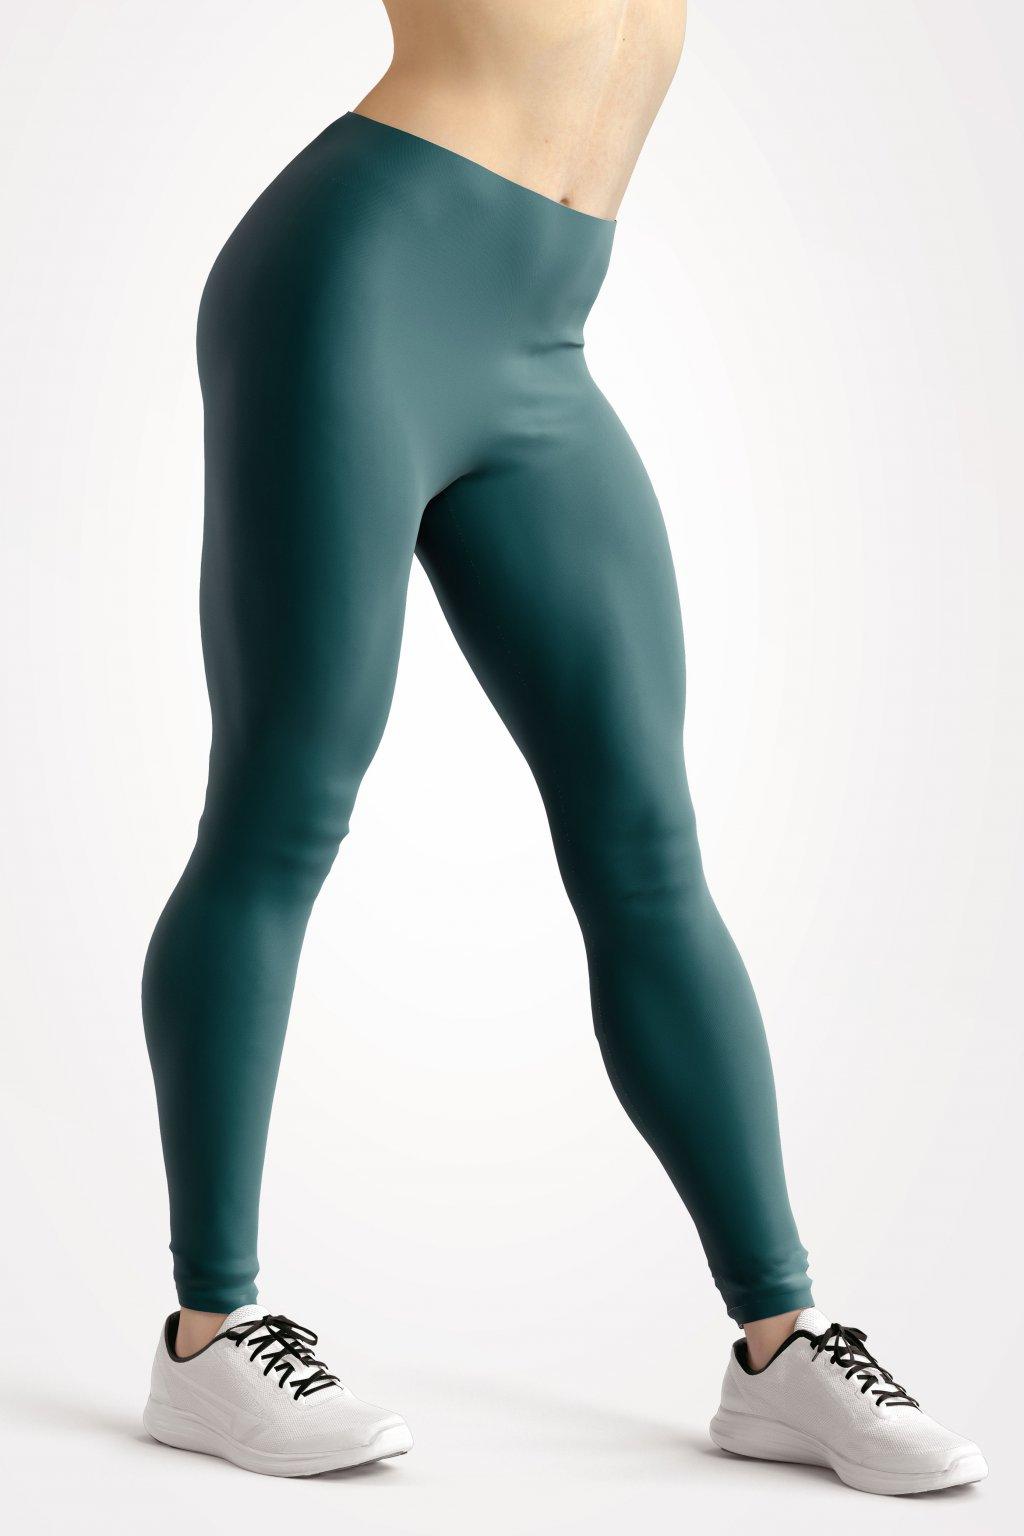 leggings teal essentials front side by utopy